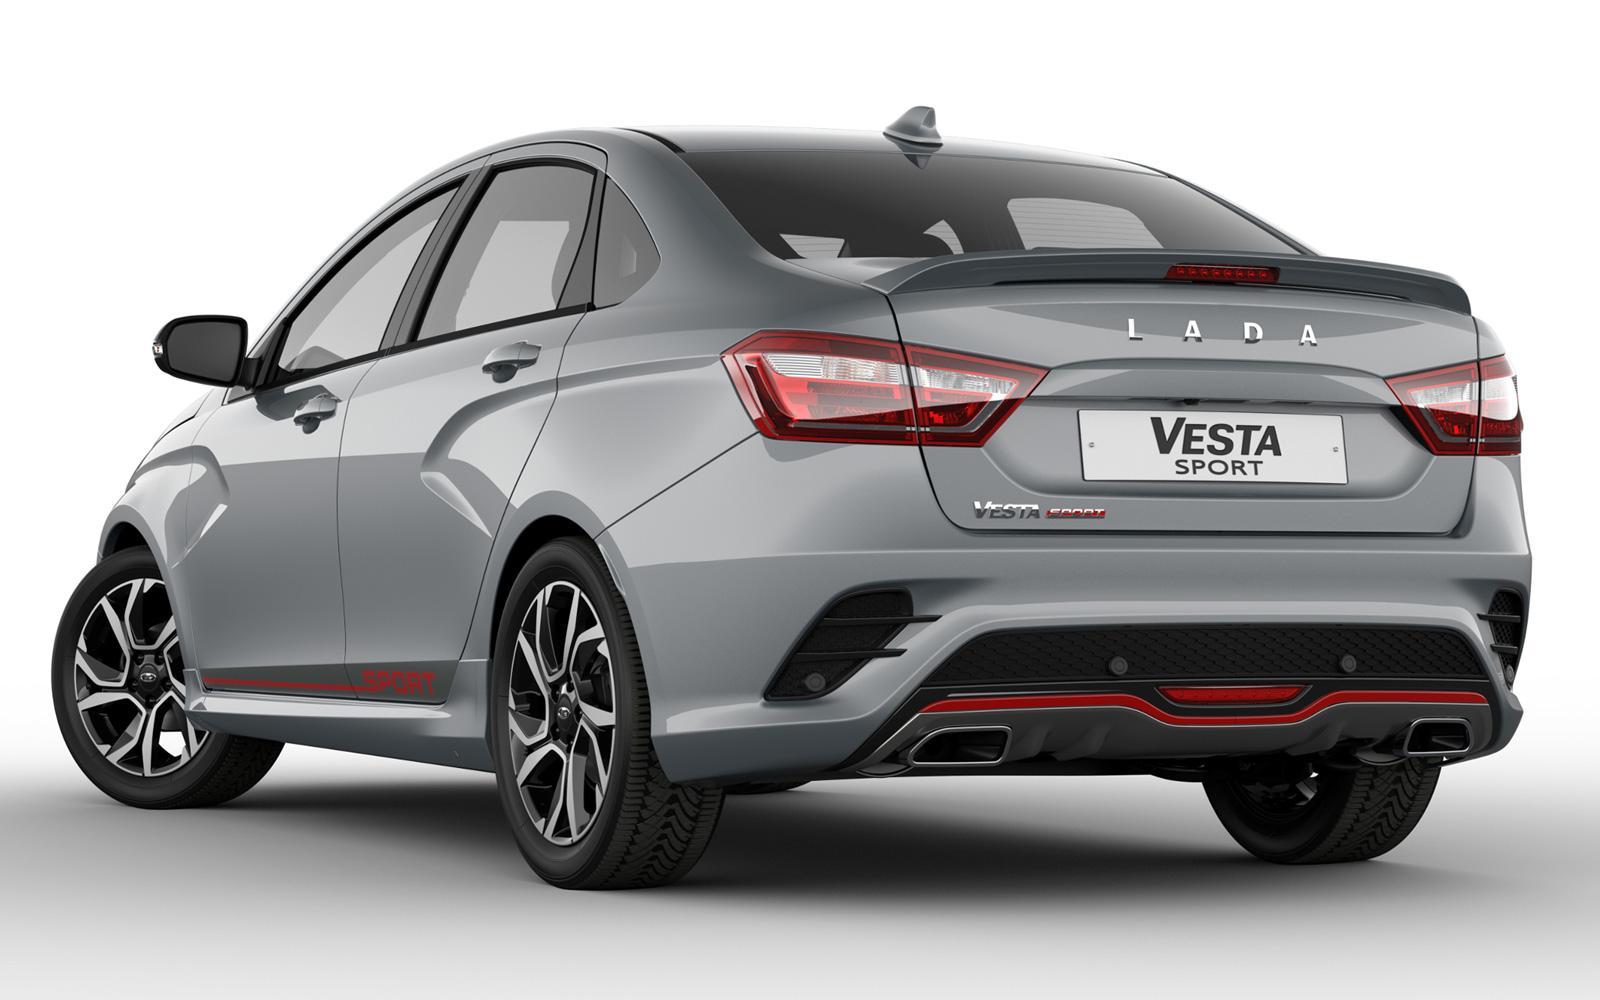 Лада Vesta стала доступнее вначальных комплектациях